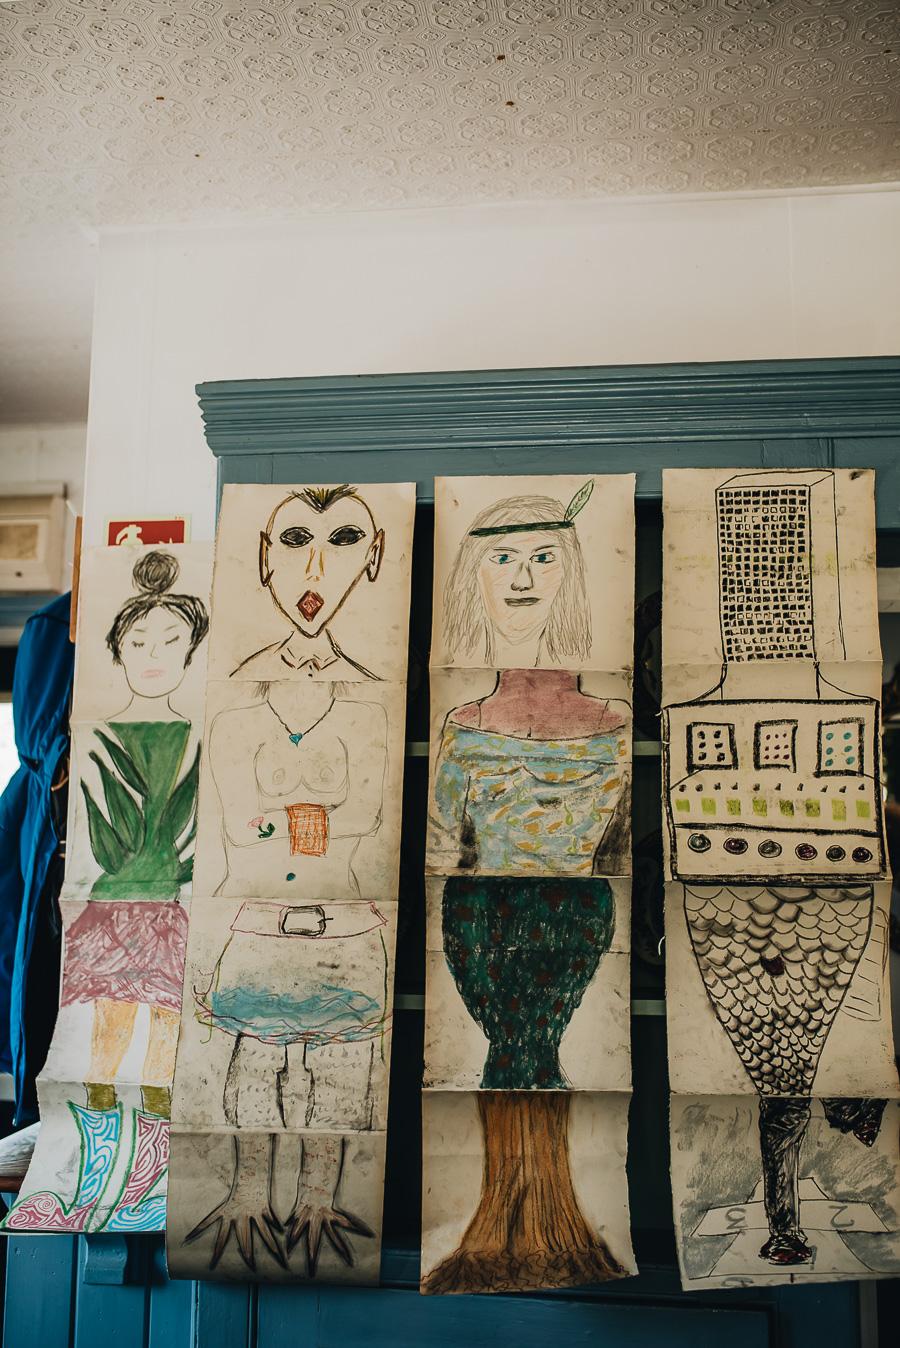 Kindling Women's Event - Swansea, South Wales - Workshop - Creativity